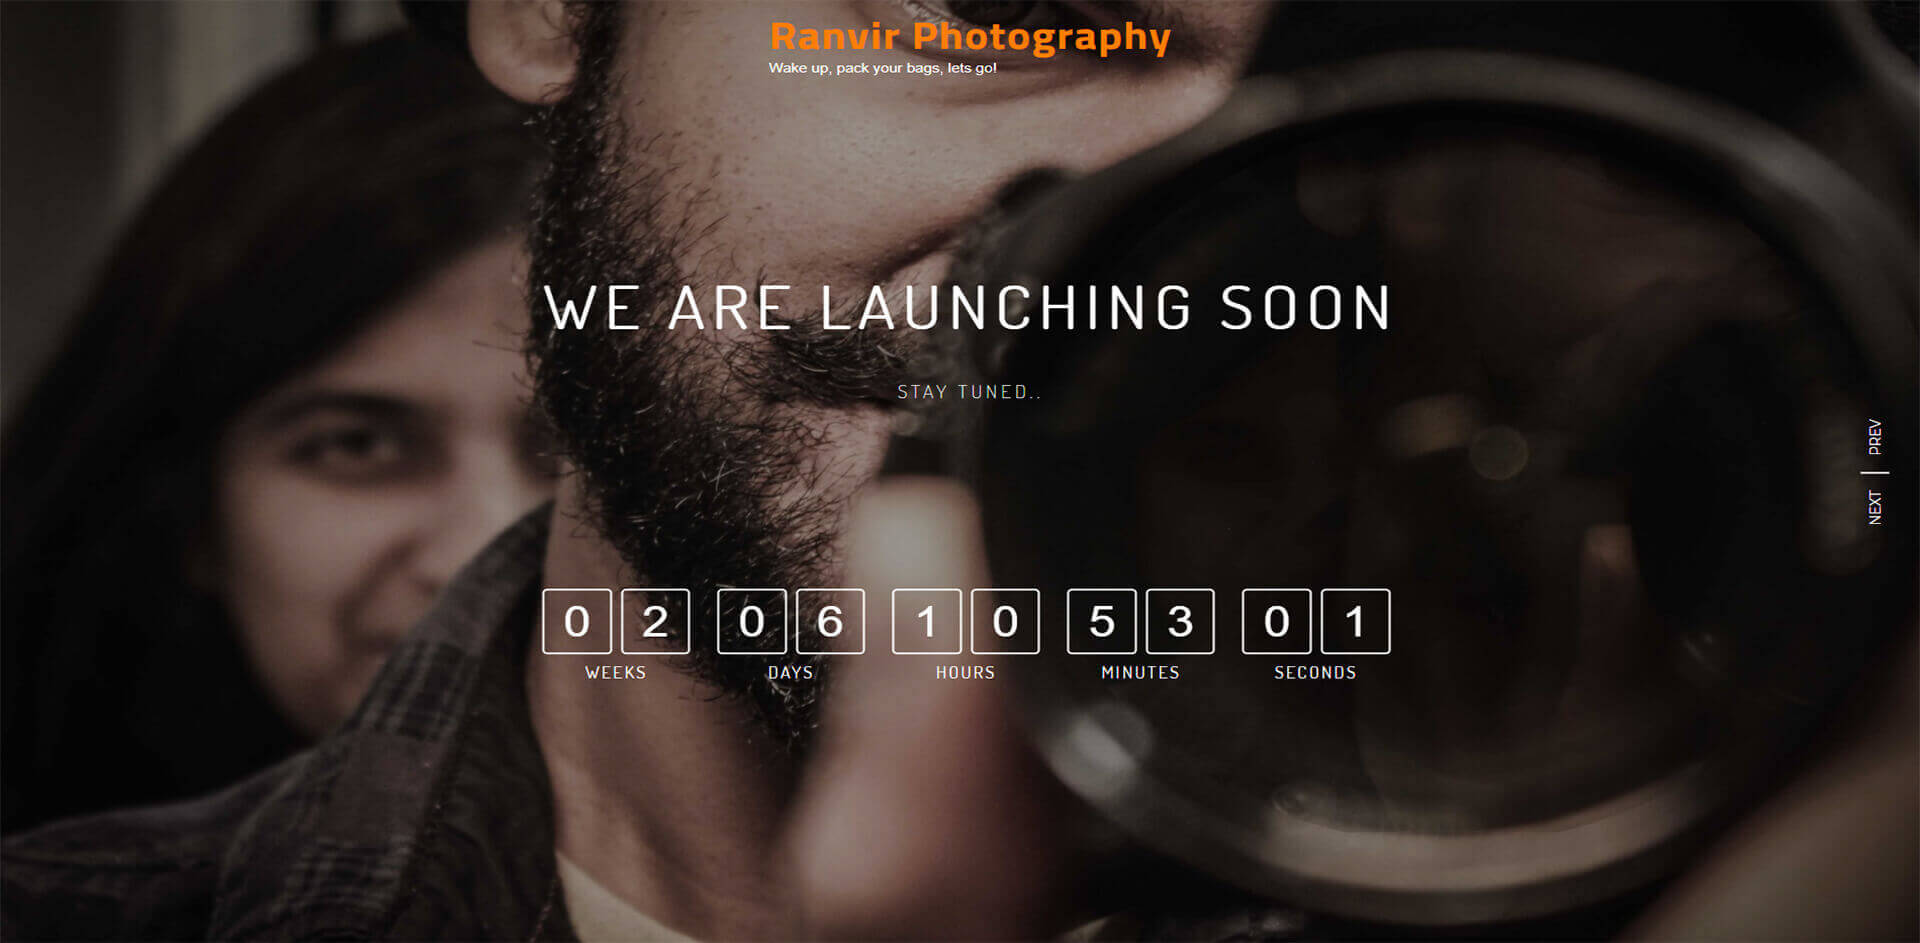 Ranvir Photography Website Banner